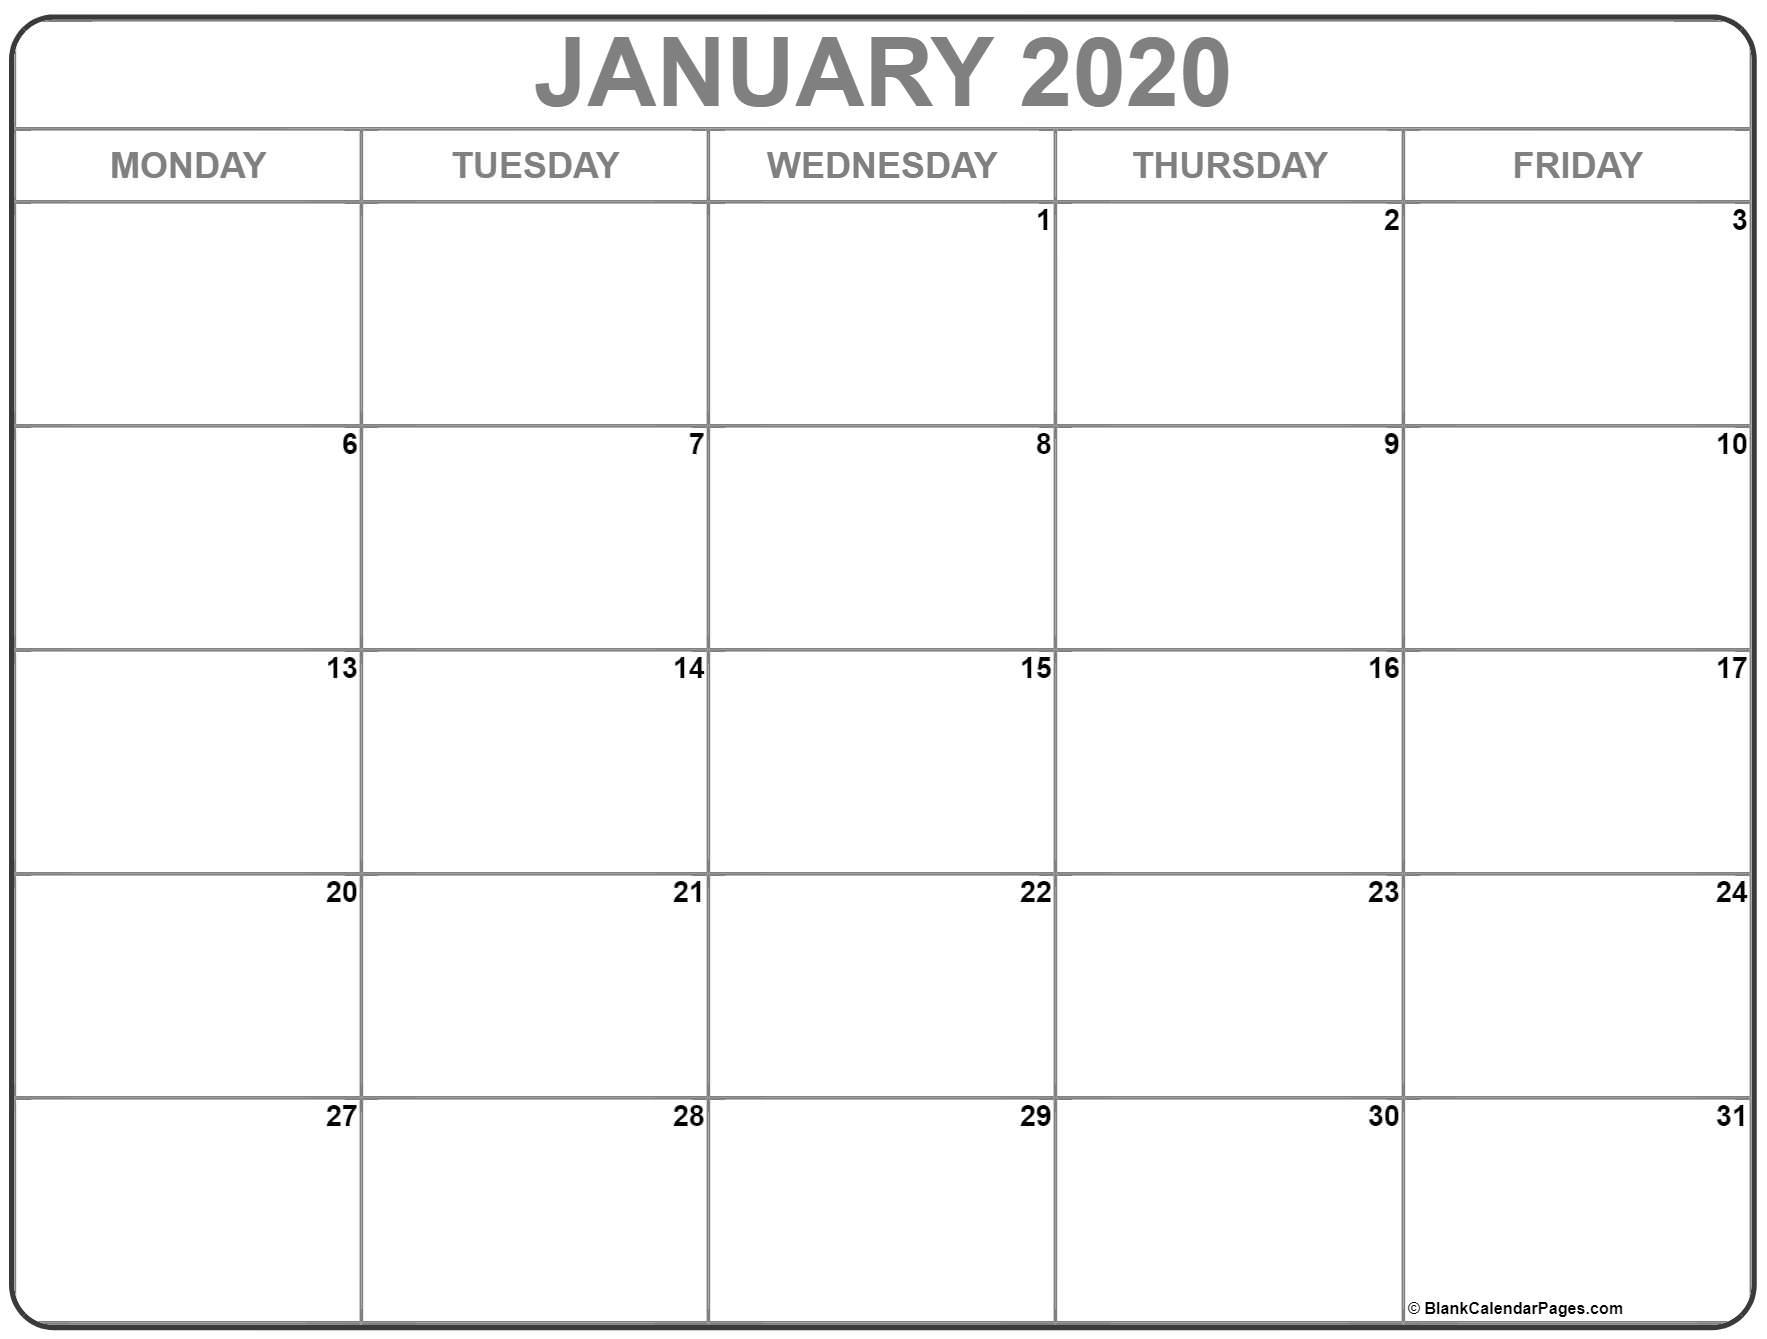 January 2020 Monday Calendar | Monday To Sunday for Printable Calendar 2020 Monday To Sunday